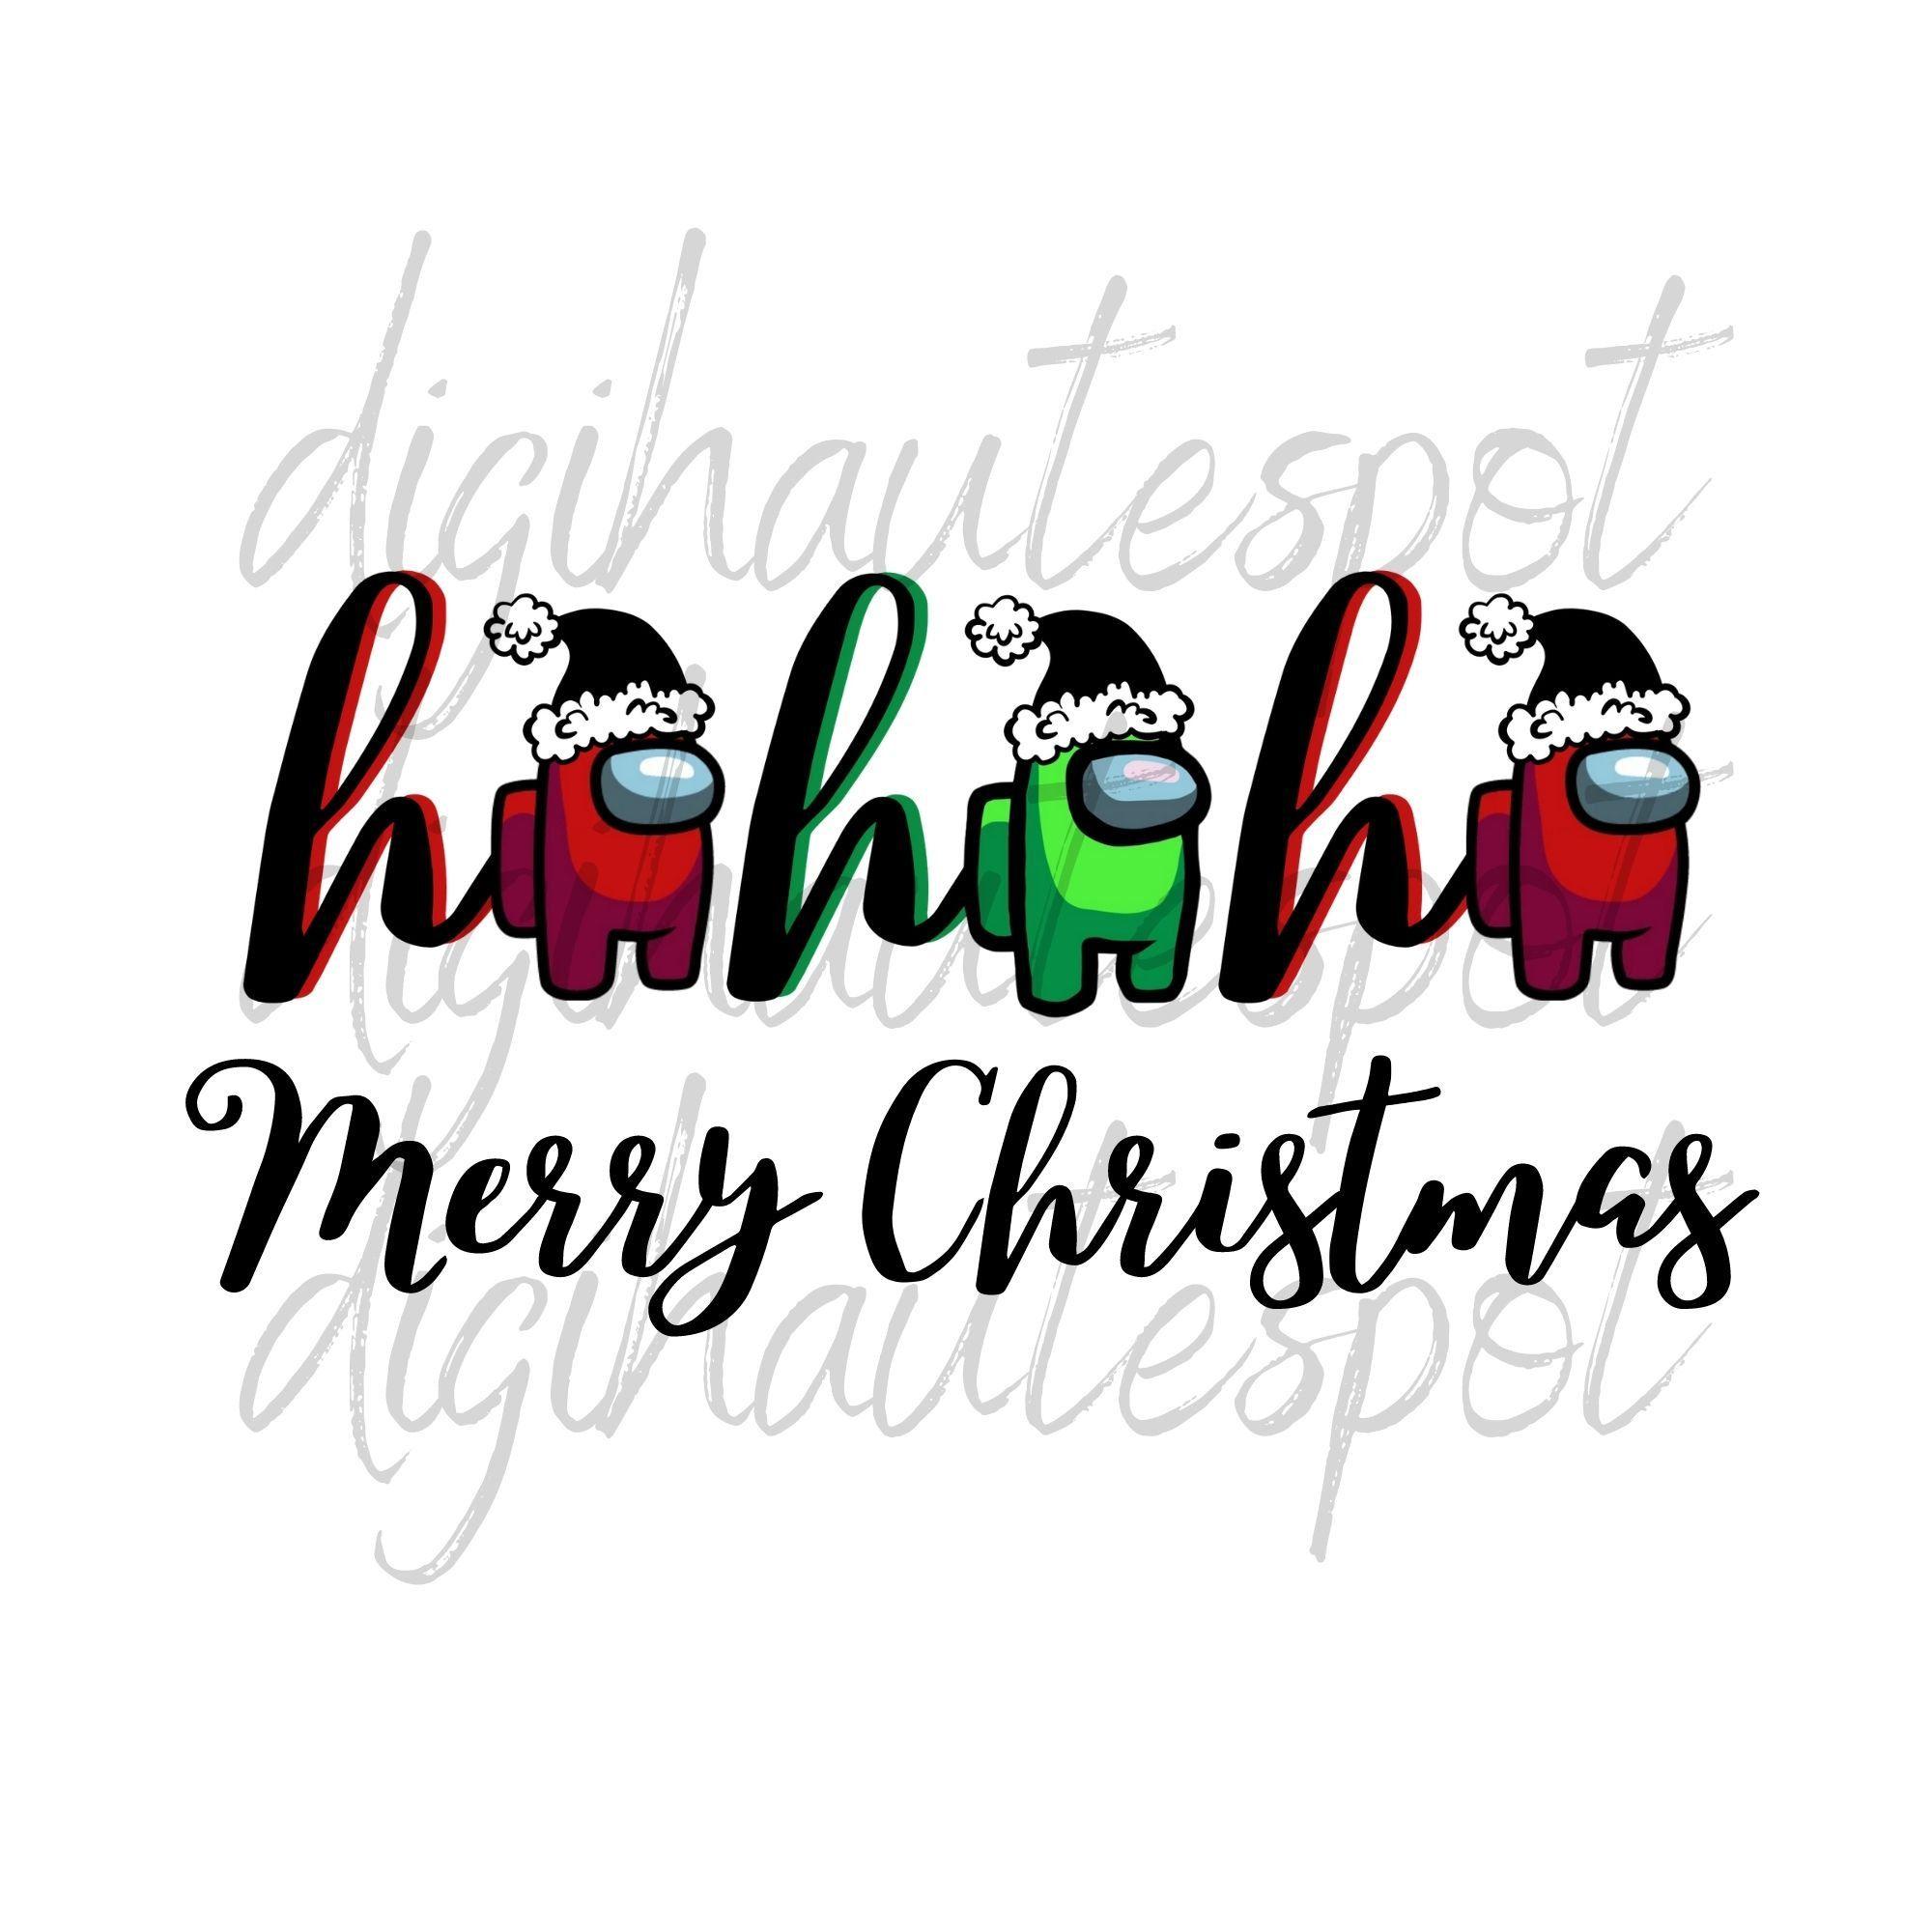 Among Us Christmas Svg Png Jpg Digital Files Etsy In 2020 Cute Christmas Wallpaper Christmas Phone Wallpaper Christmas Svg